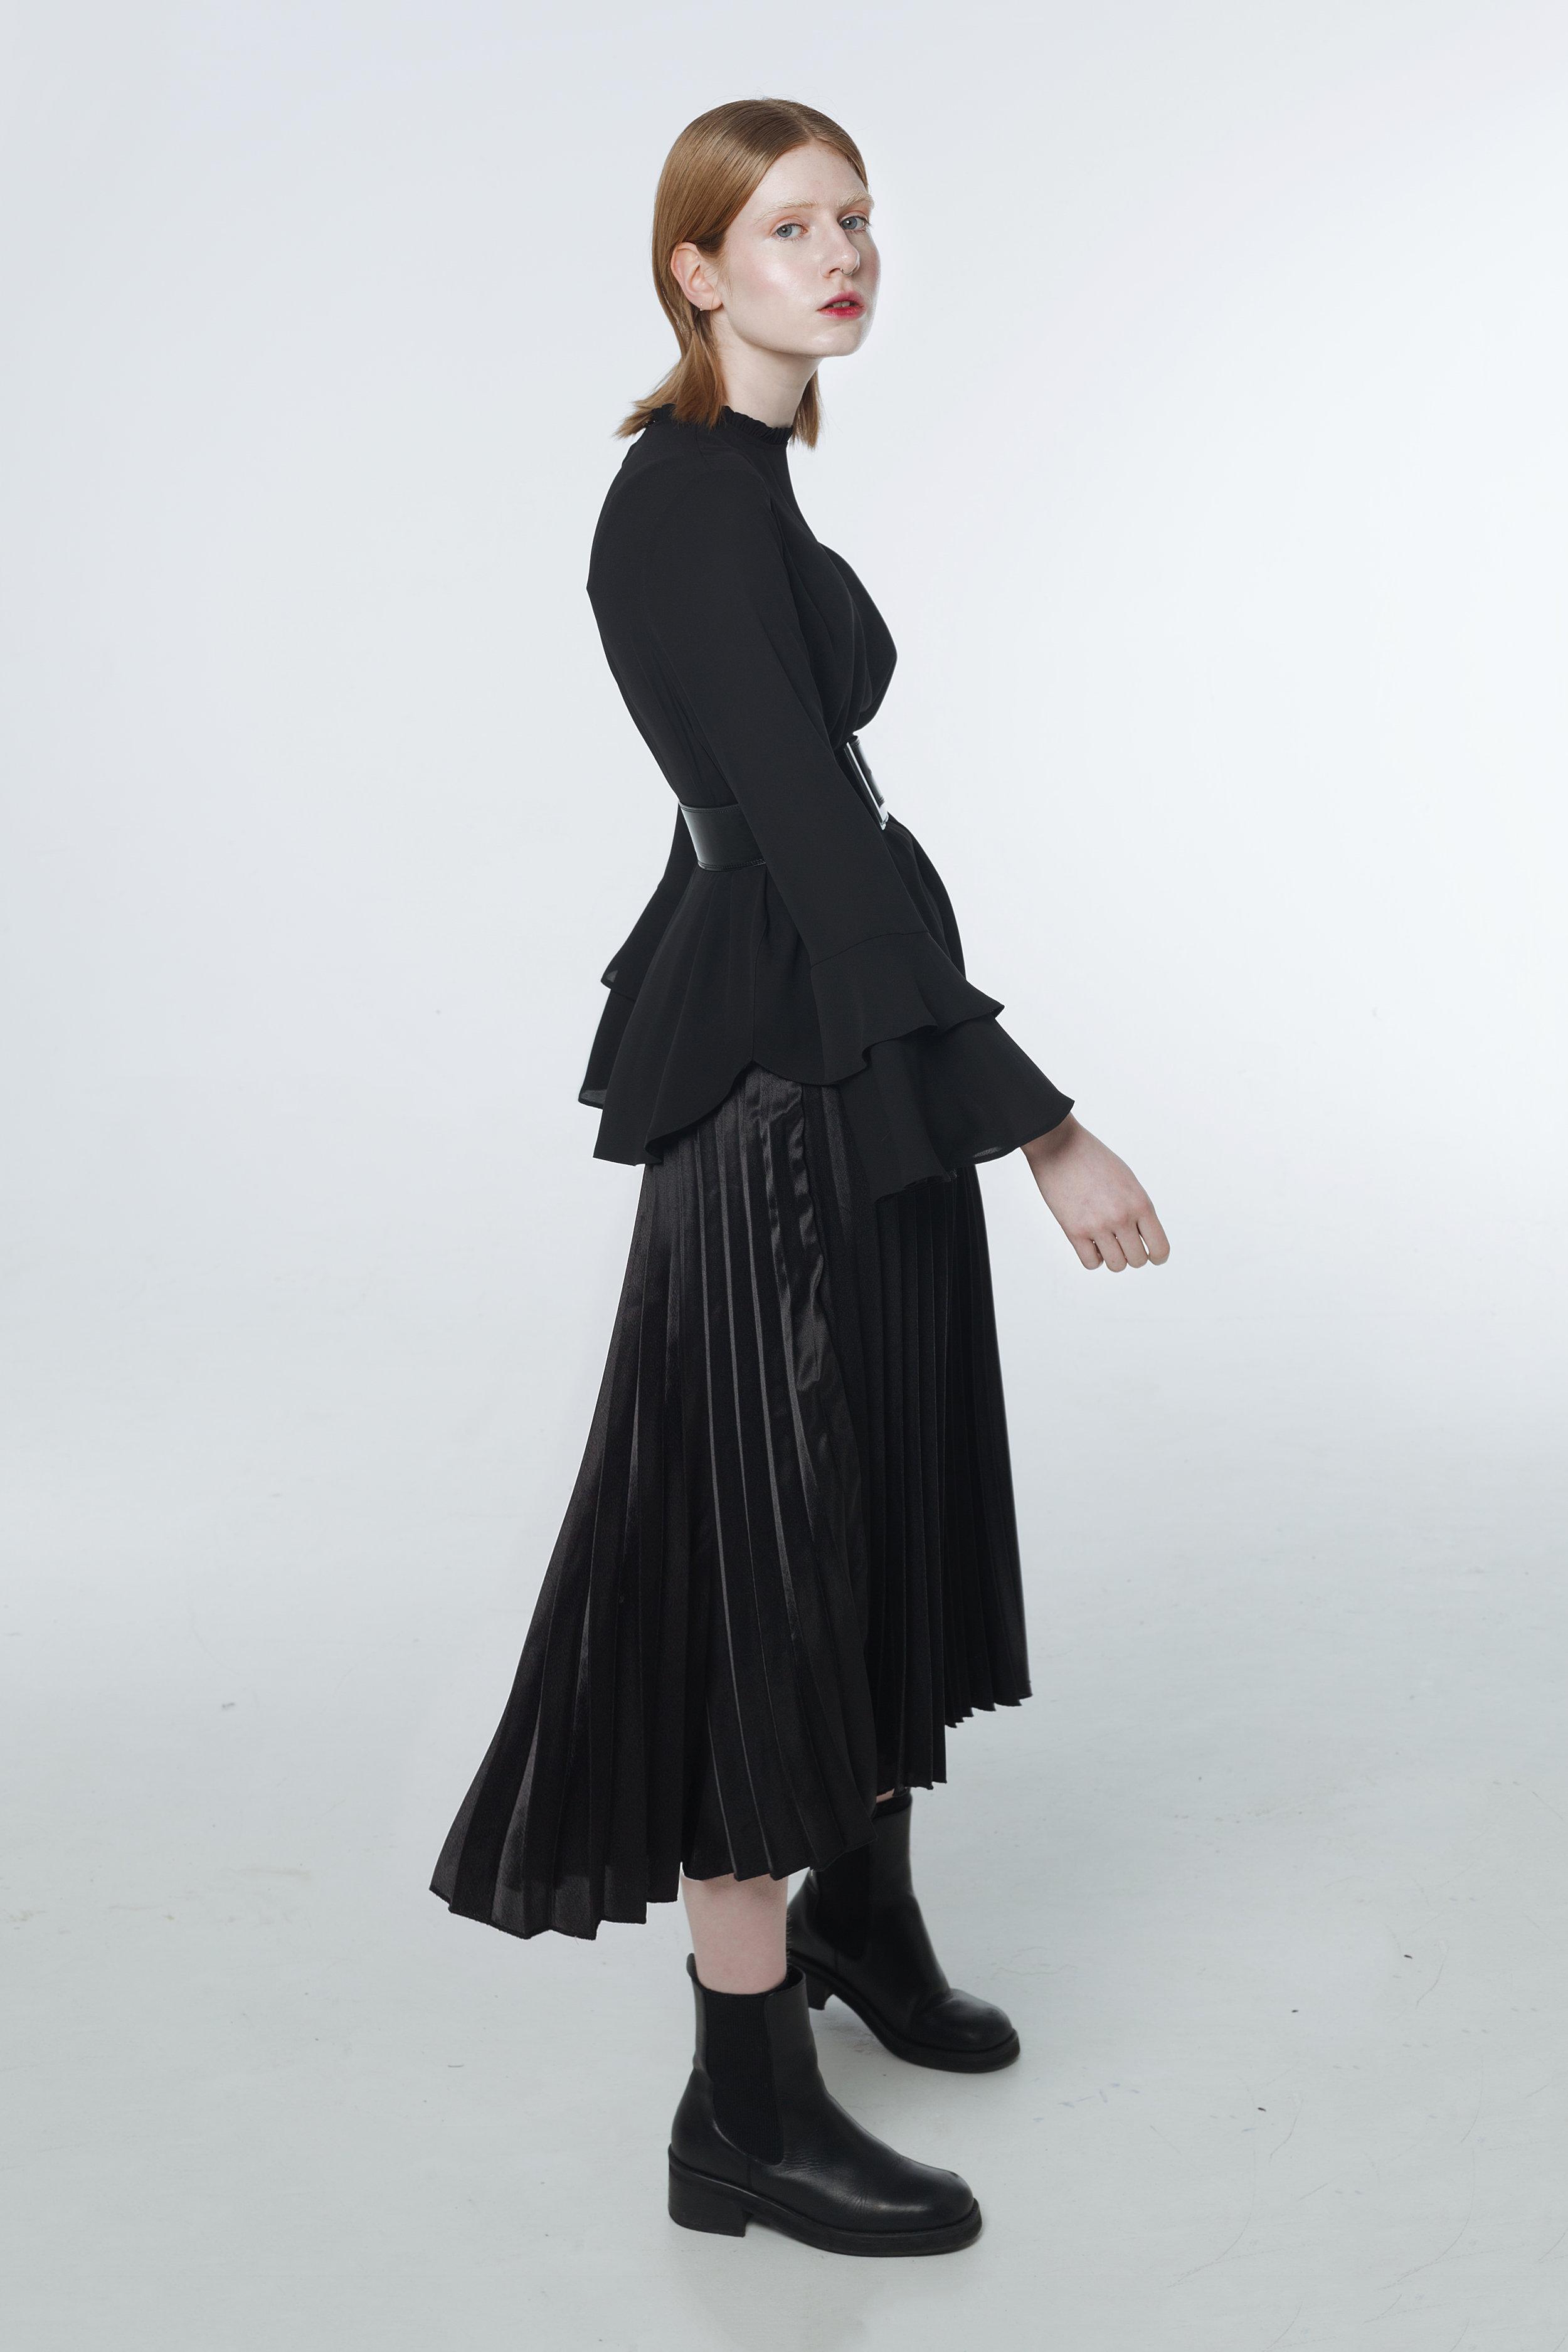 Top / Dorothy Perkins  Belt / Original Penguin  Skirt / Primark  Boots / E8 by MIISTA